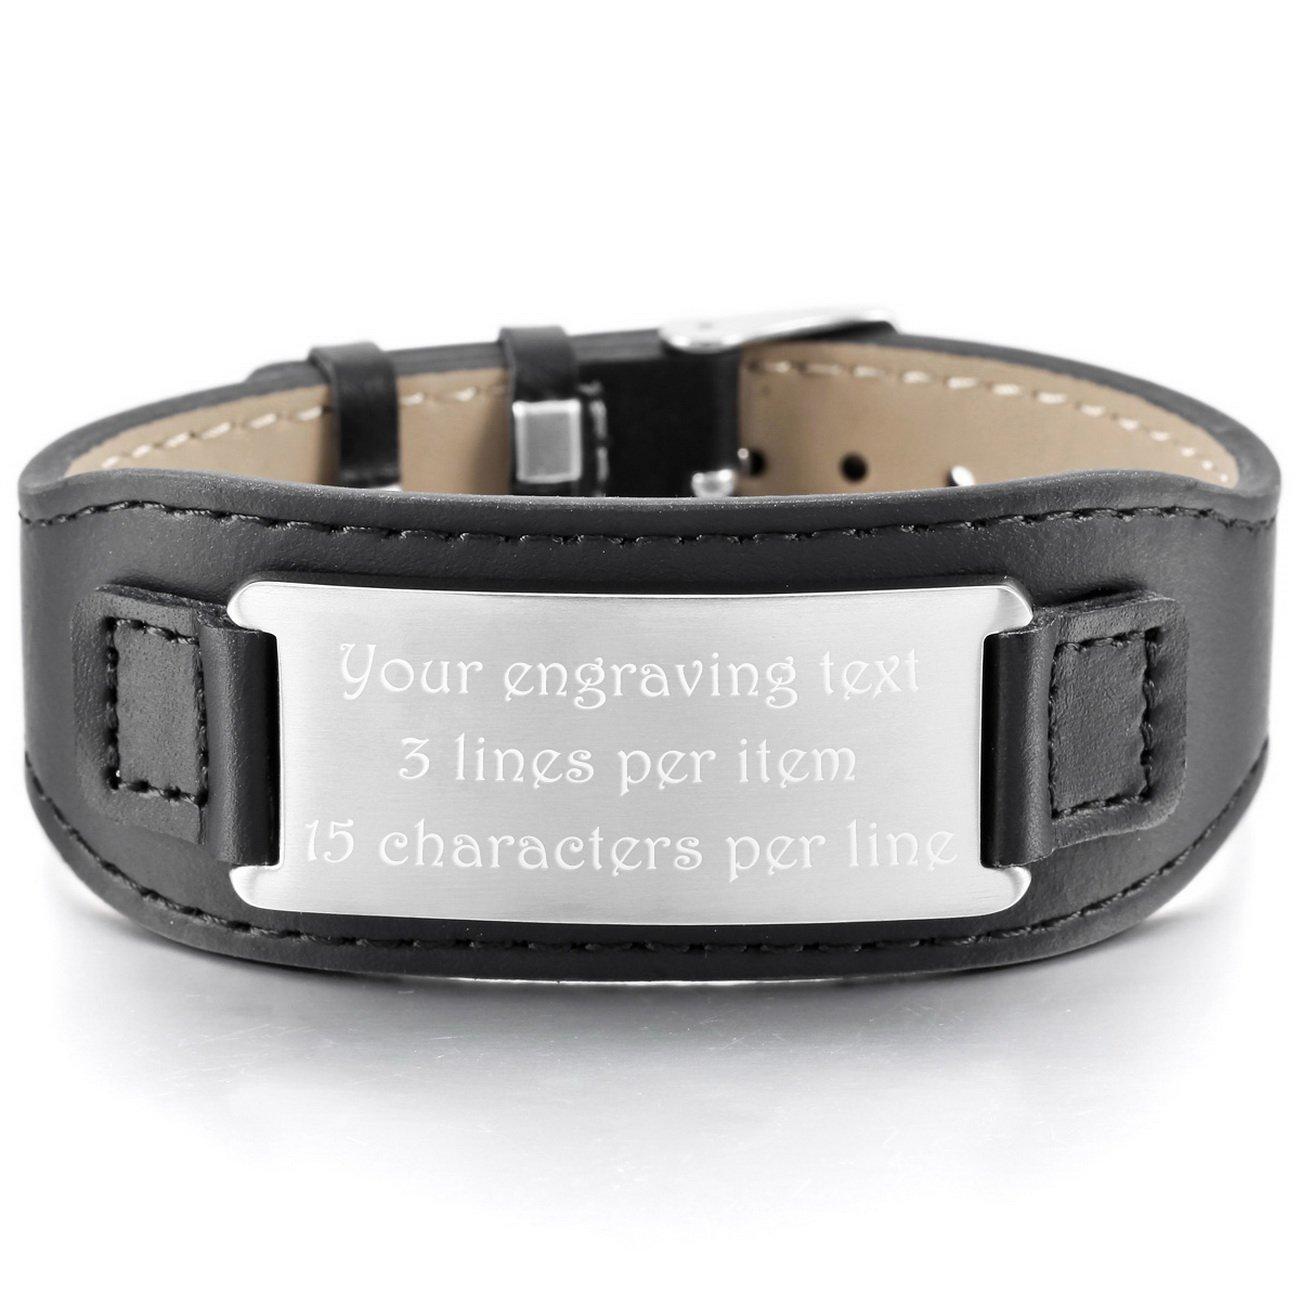 MeMeDIY Stainless Steel Genuine Leather Bracelet Bangle Cuff Adjustable - Customized Engraving us3020047-1